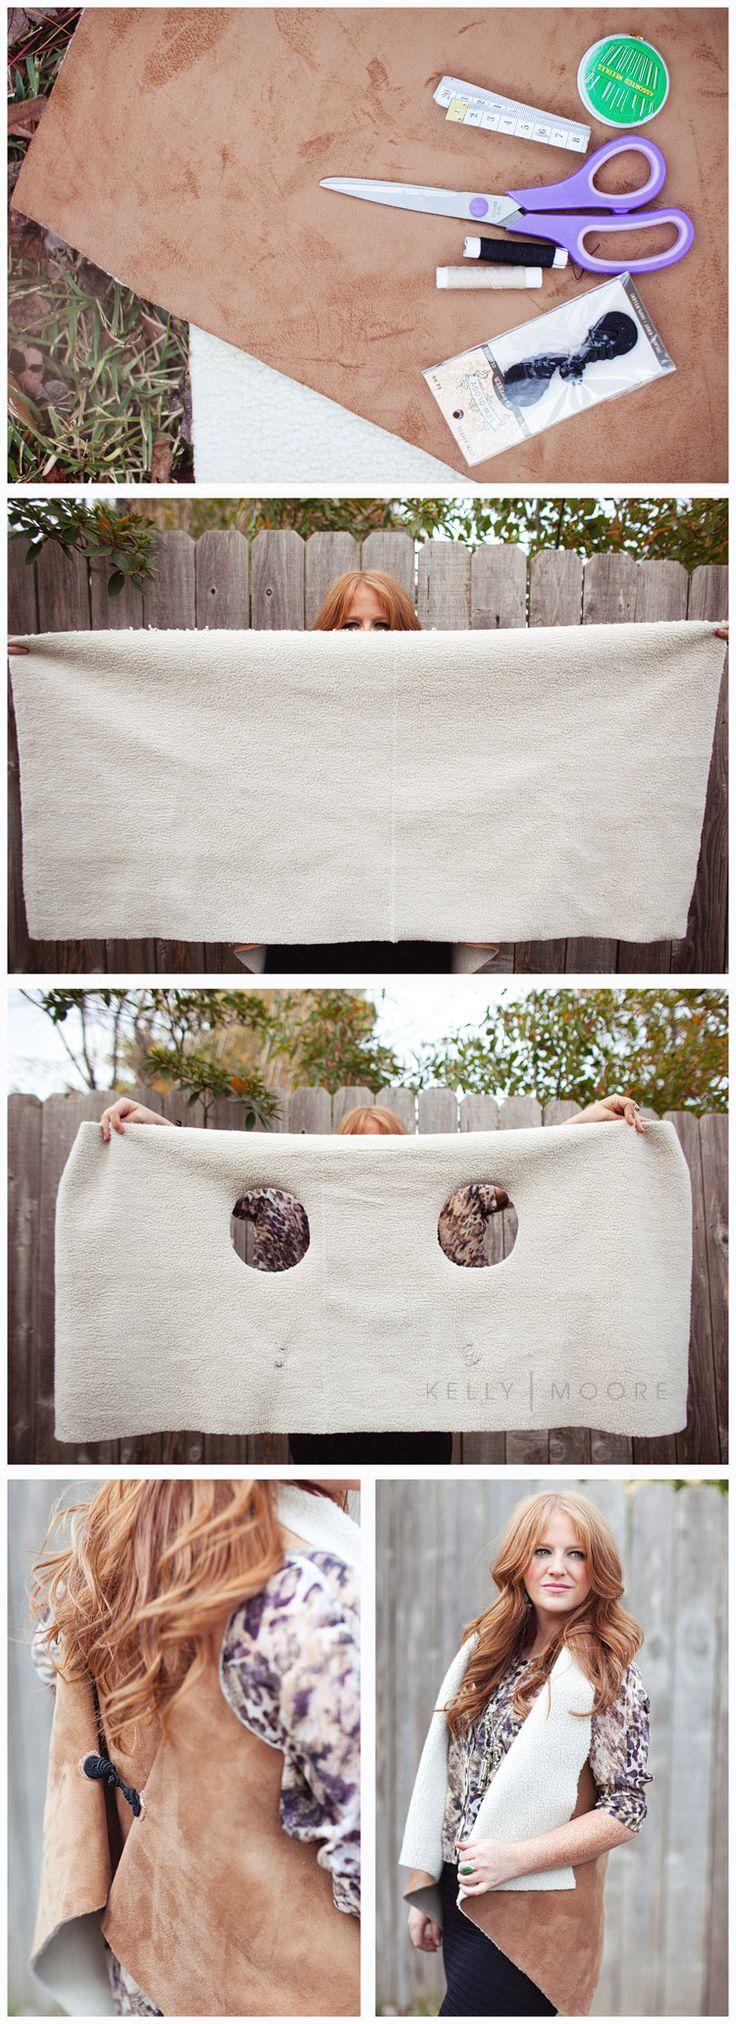 #DIY shearling vest via KellyMoorebag.com